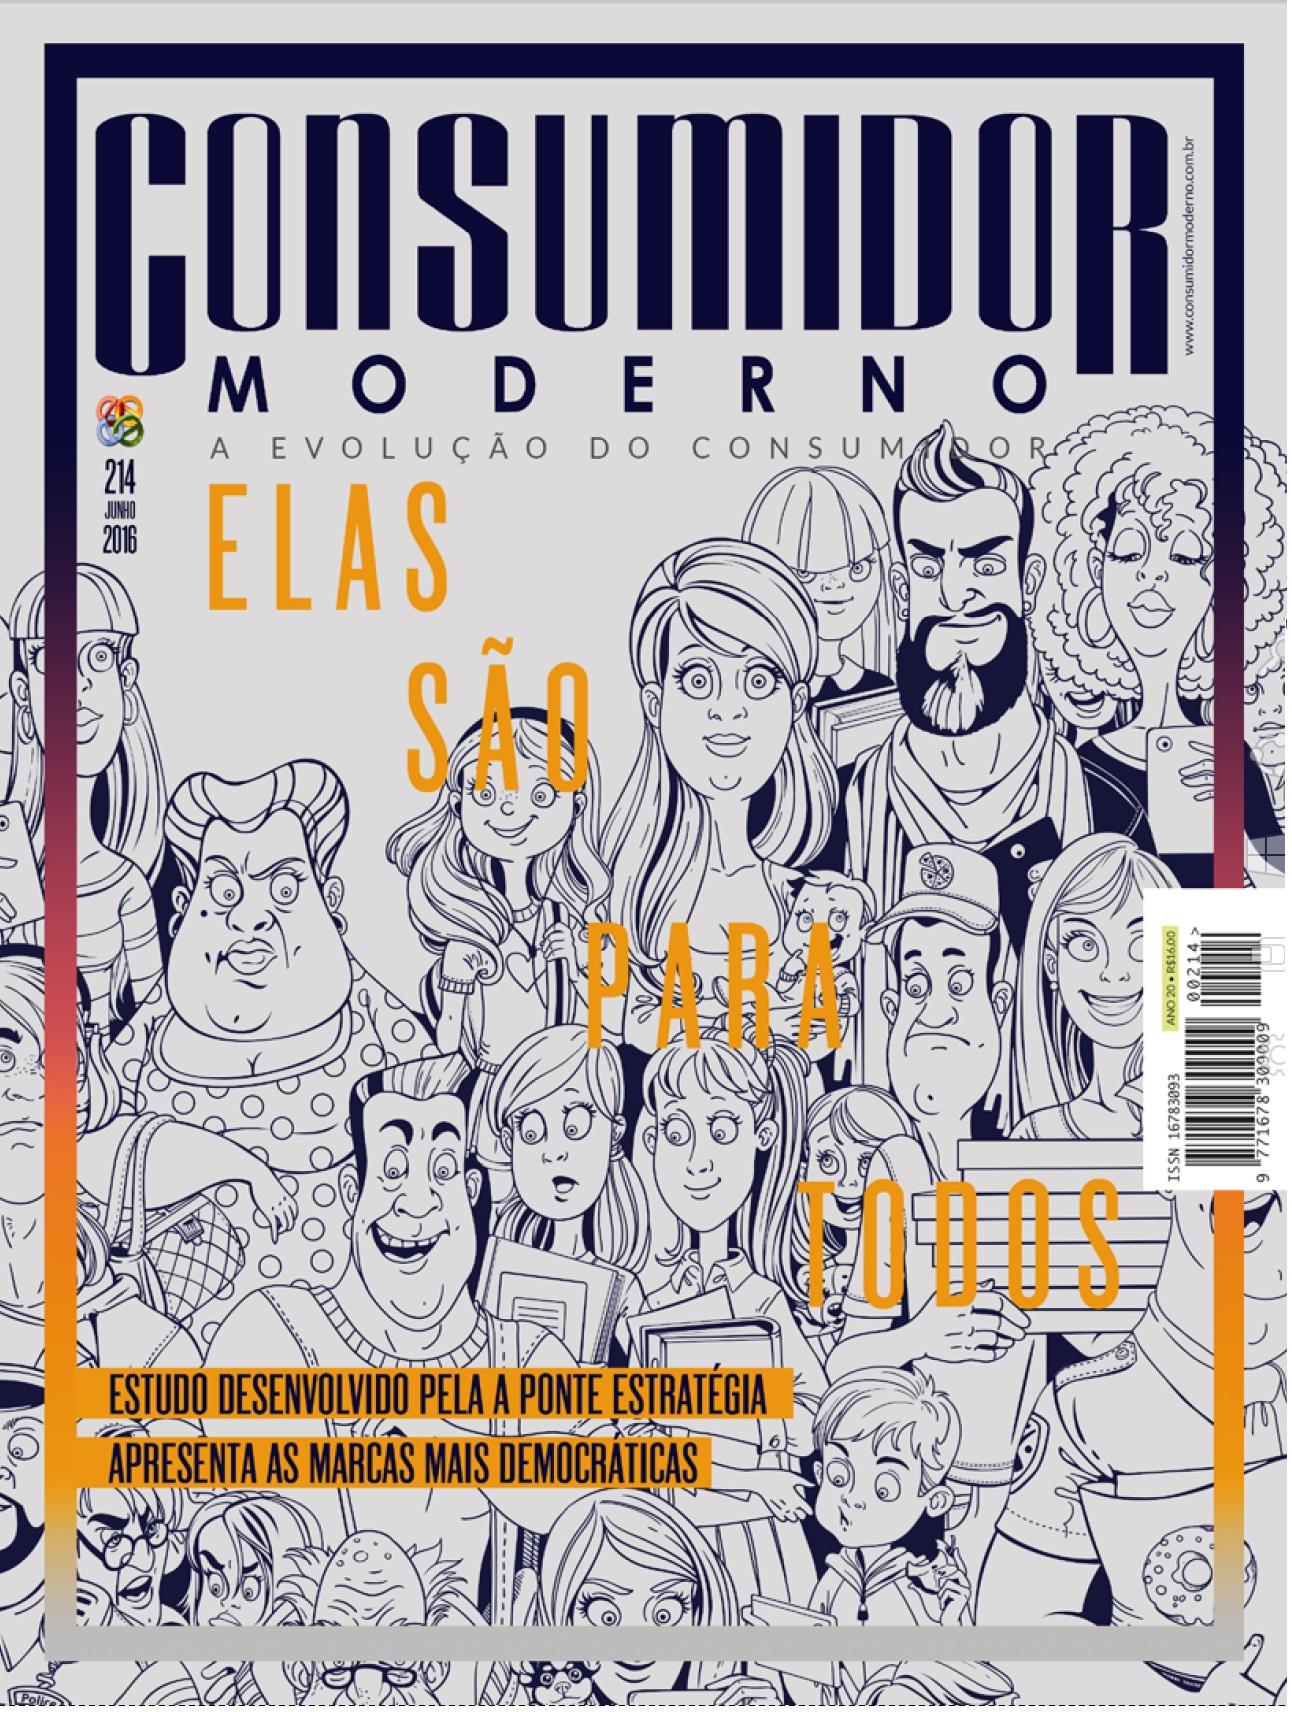 Consumoteca na Consumidor Moderno _Junho_CAPA